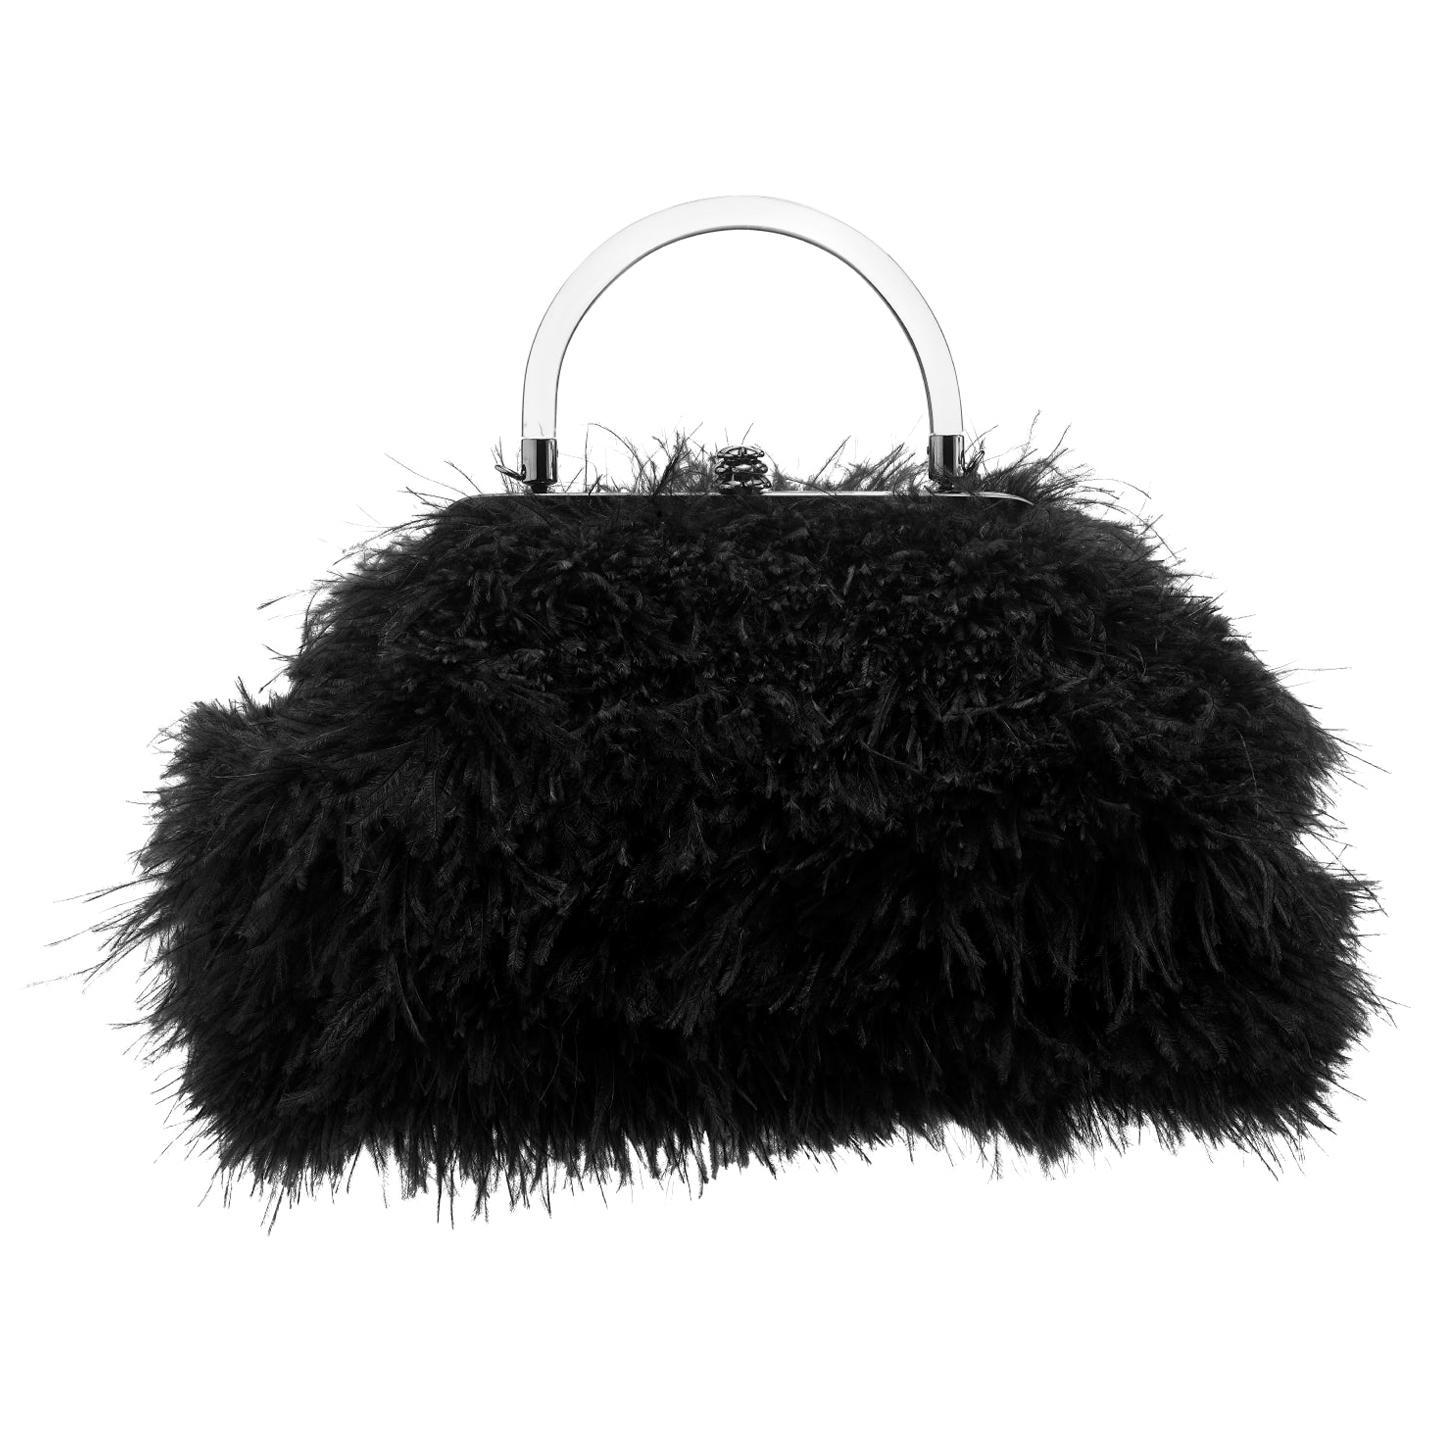 TYLER ELLIS Poppy Handbag Small in Black Ostrich Feathers with Gunmetal Hardware